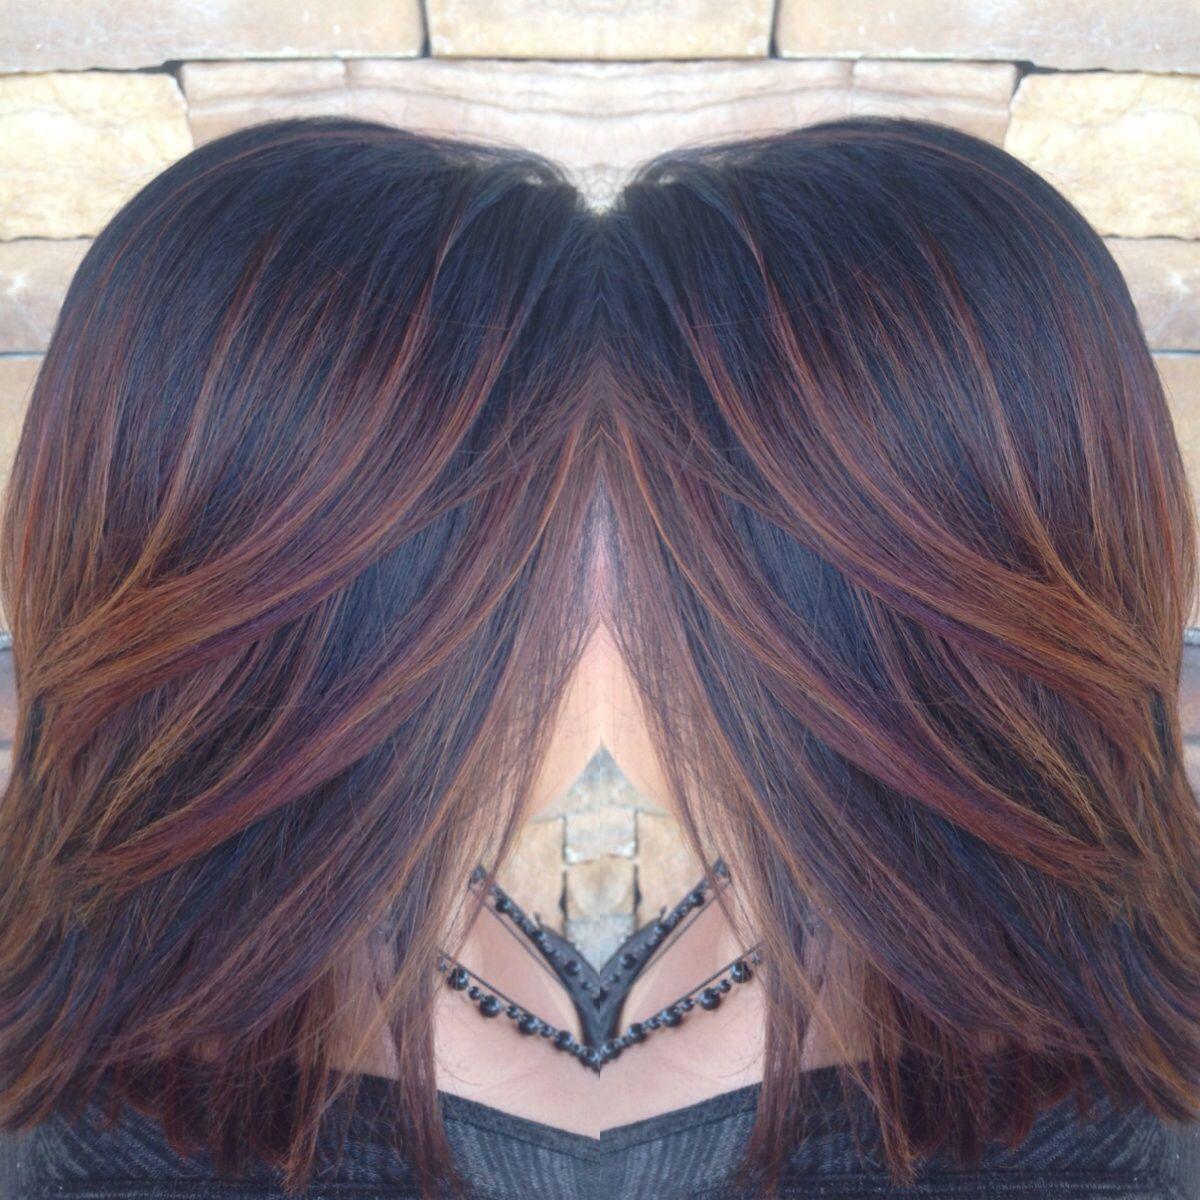 Pin By Lauramichellebeauty Wendt On Laura Michelle Beauty Black Hair Balayage Hair Highlights Hair Color Auburn